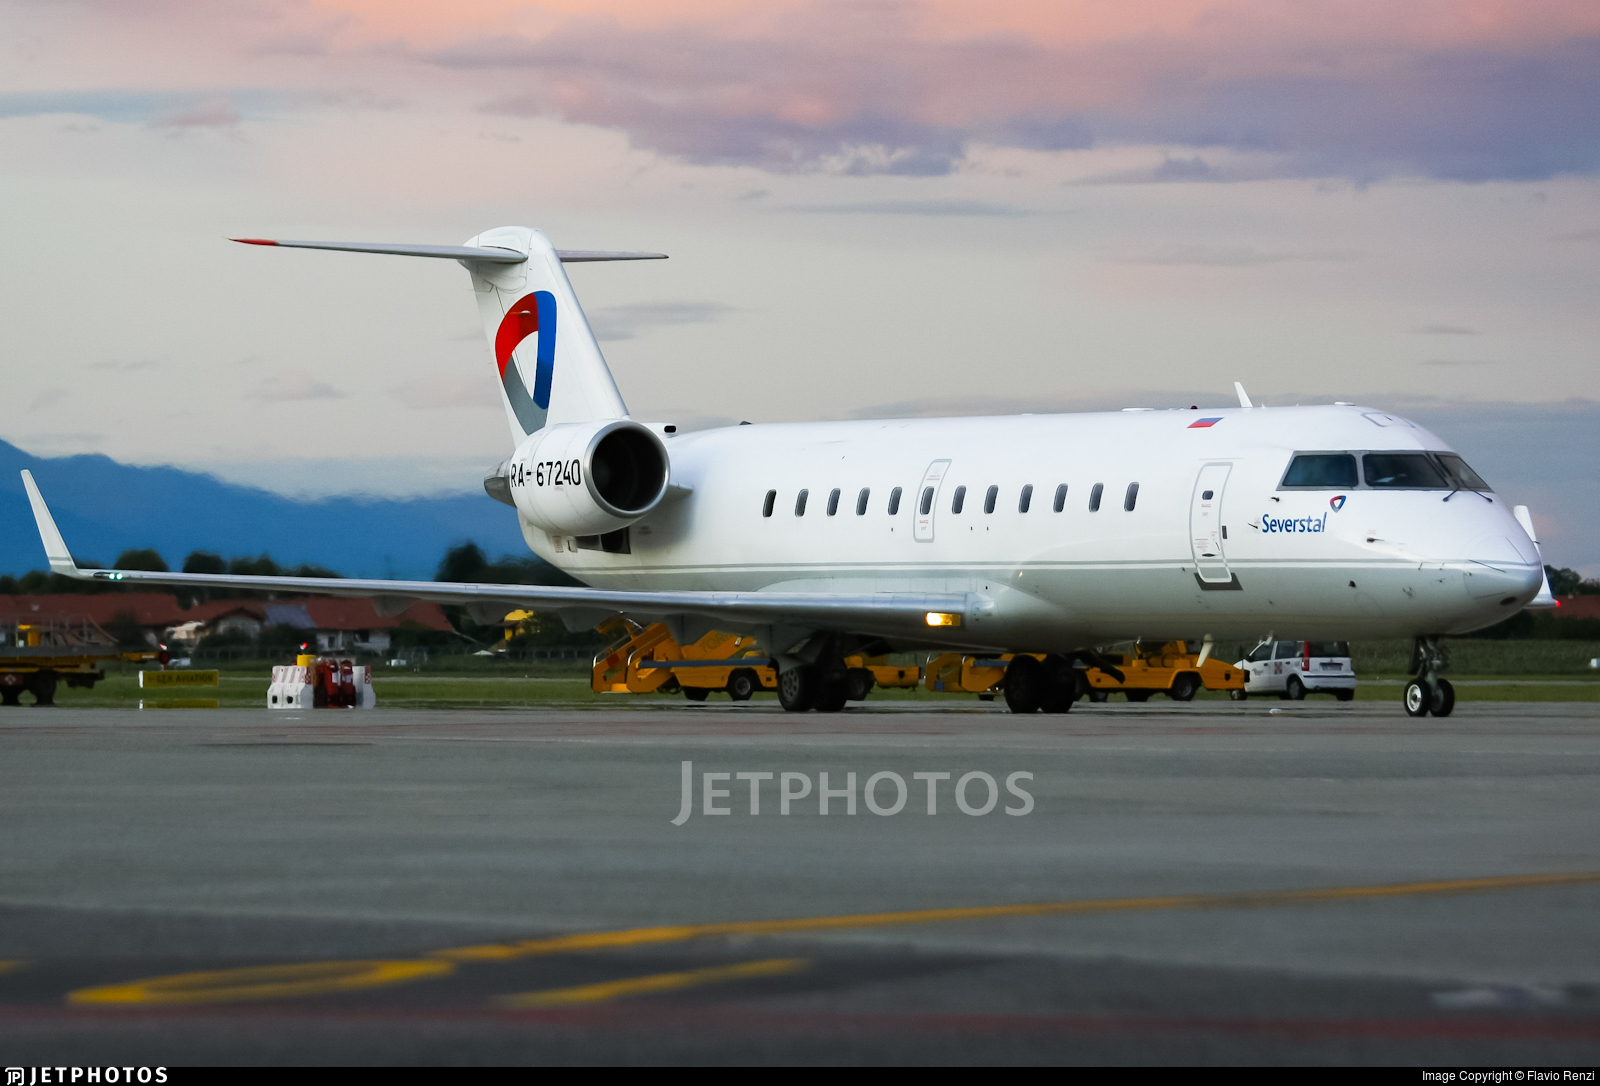 RA-67240 - Bombardier CRJ-200LR - Severstal Air Company